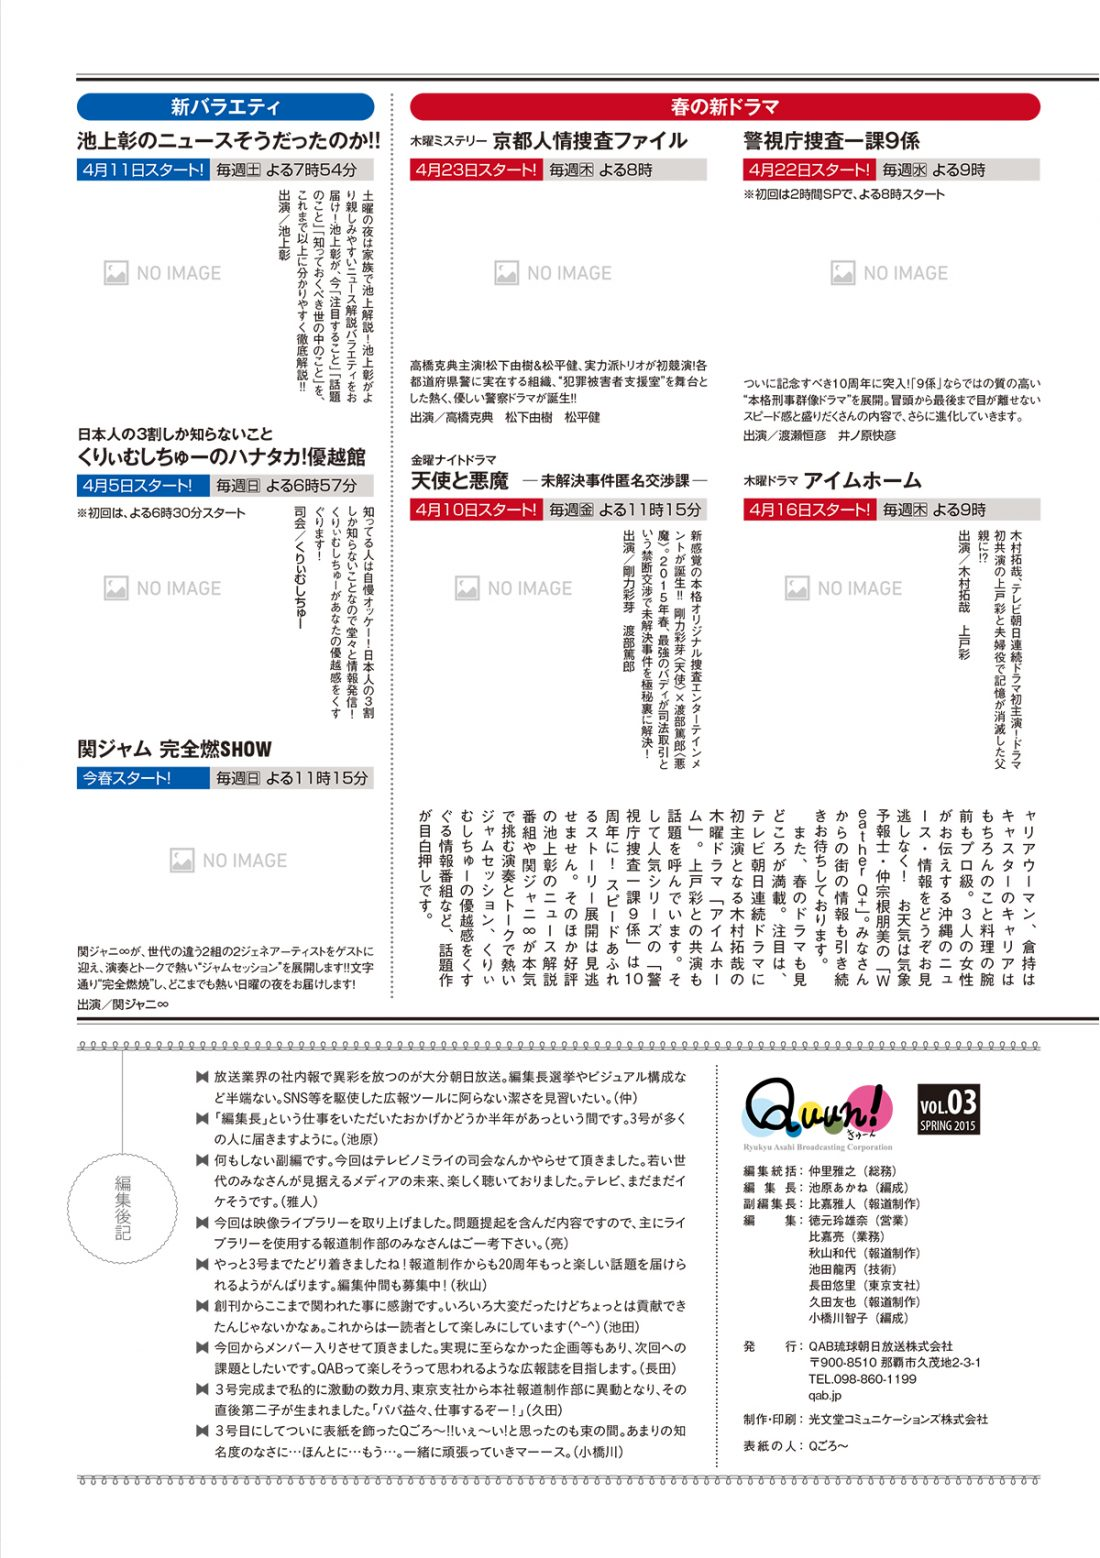 http://www.qab.co.jp/qgoro/wp-content/uploads/quun_0315-1100x1558.jpg